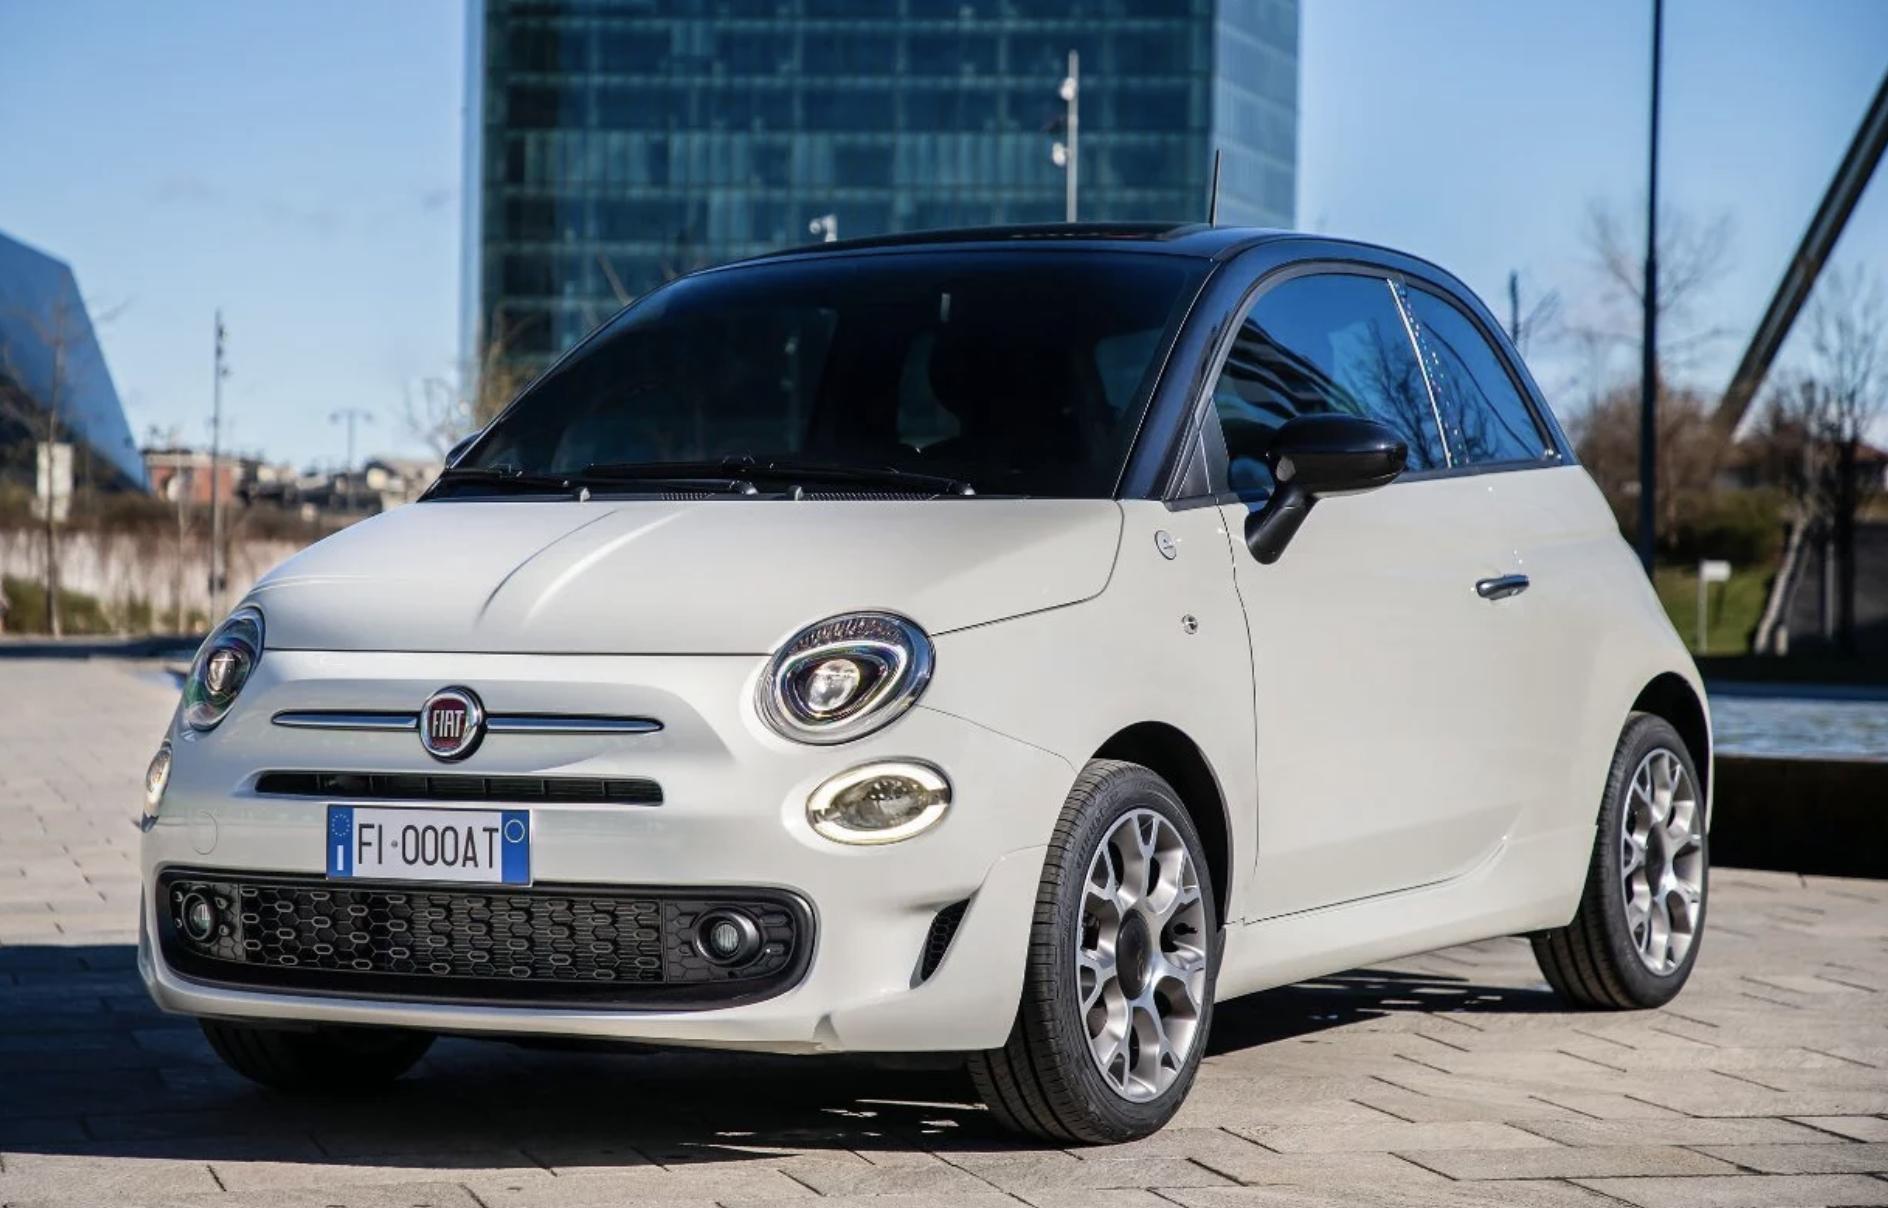 Fiat. and Google partnership